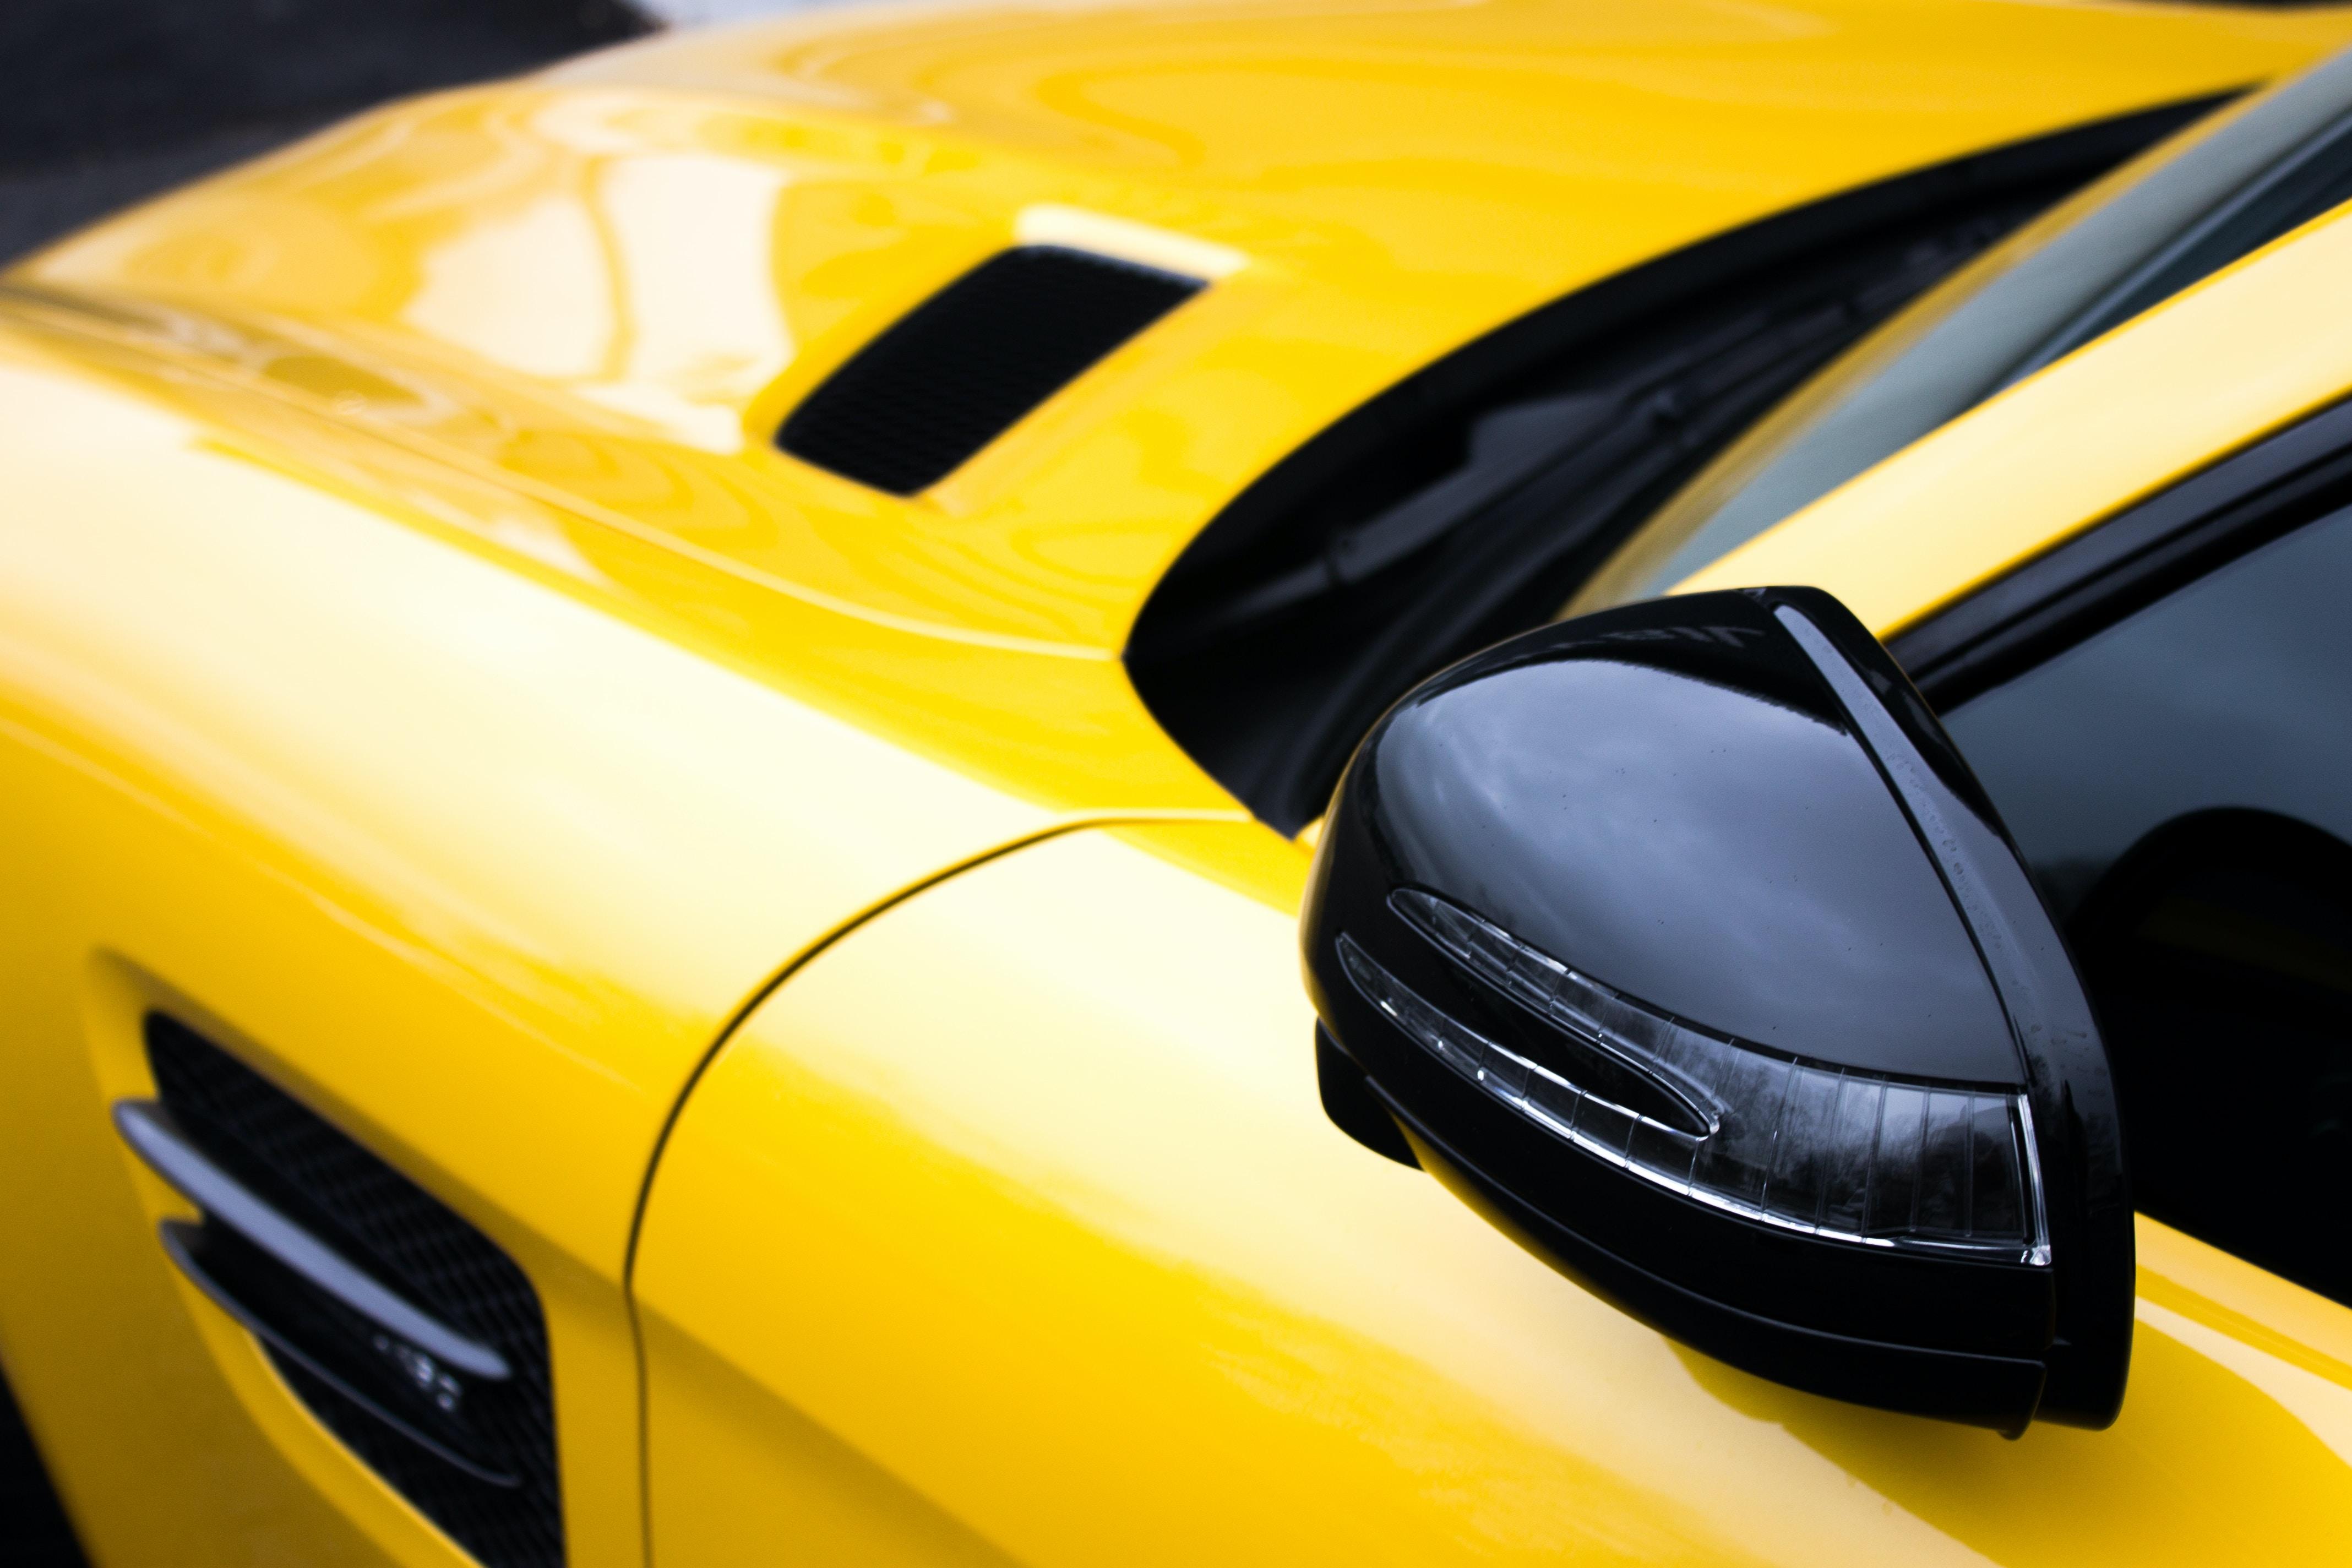 closeup photo of yellow and black car